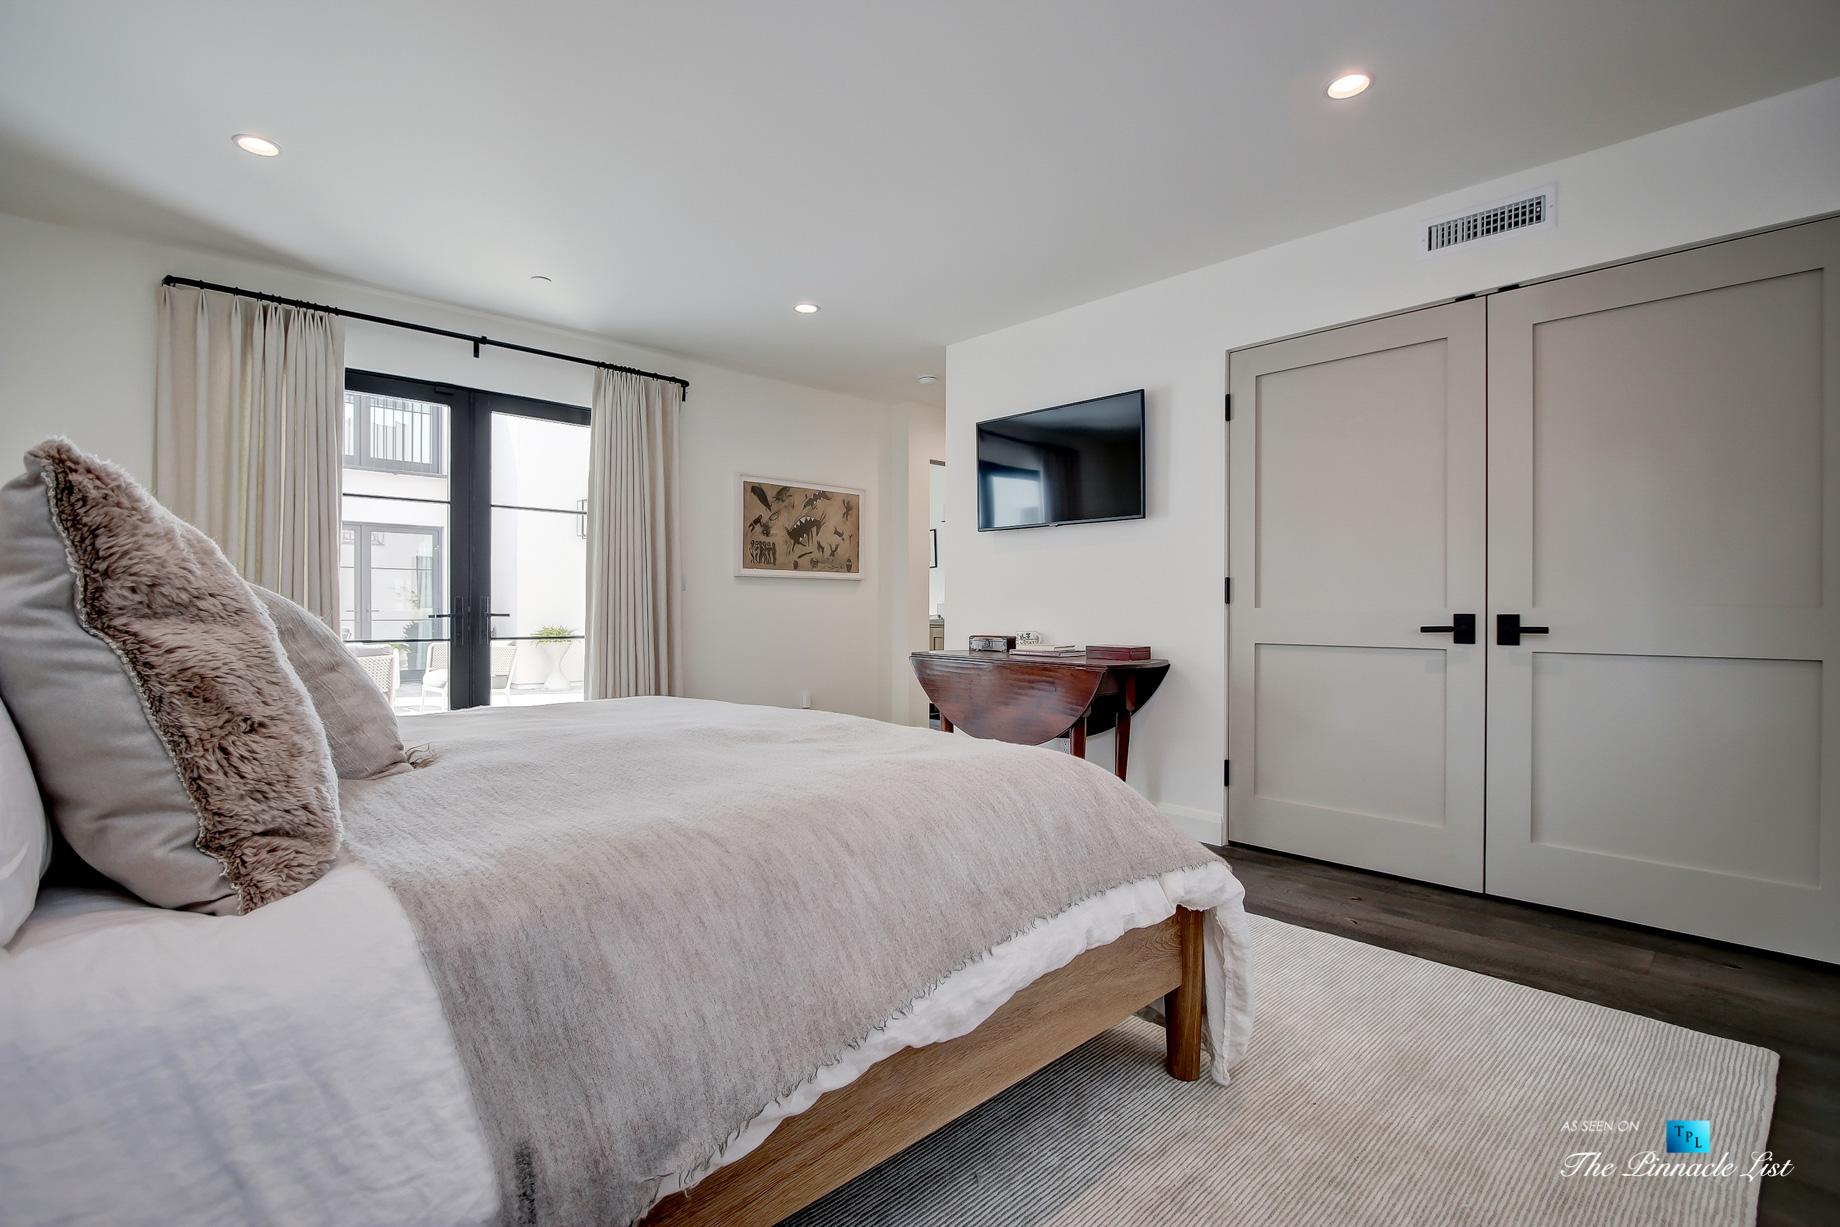 825 Highview Ave, Manhattan Beach, CA, USA – Bedroom – Luxury Real Estate – Modern Spanish Home